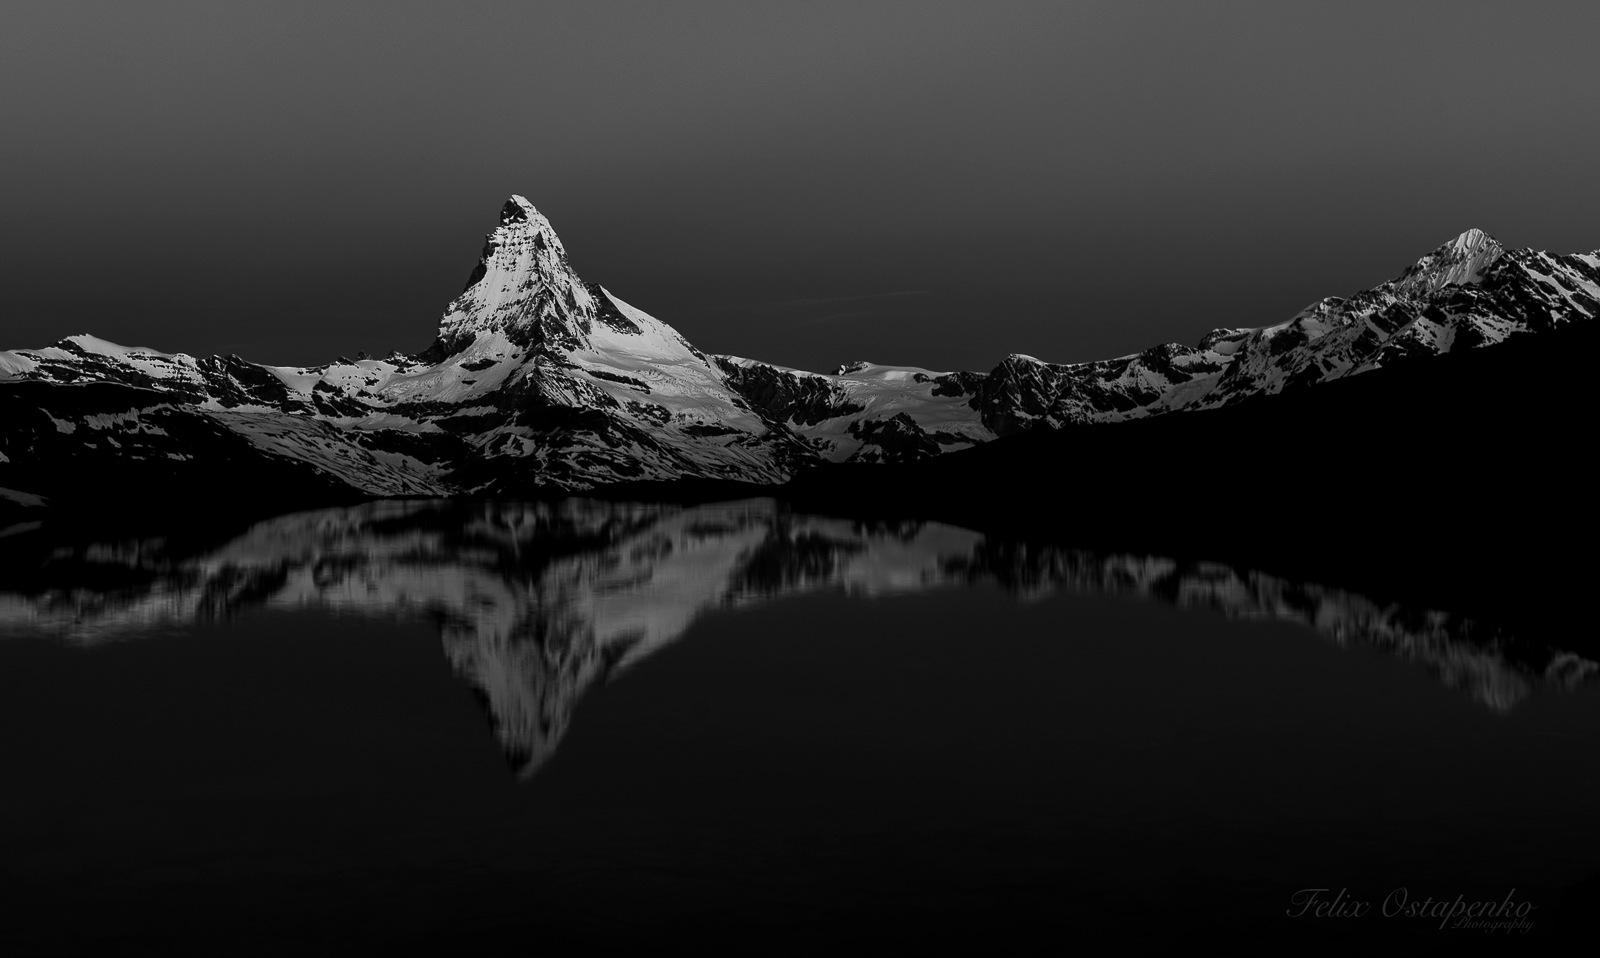 from the dark by Felix Ostapenko